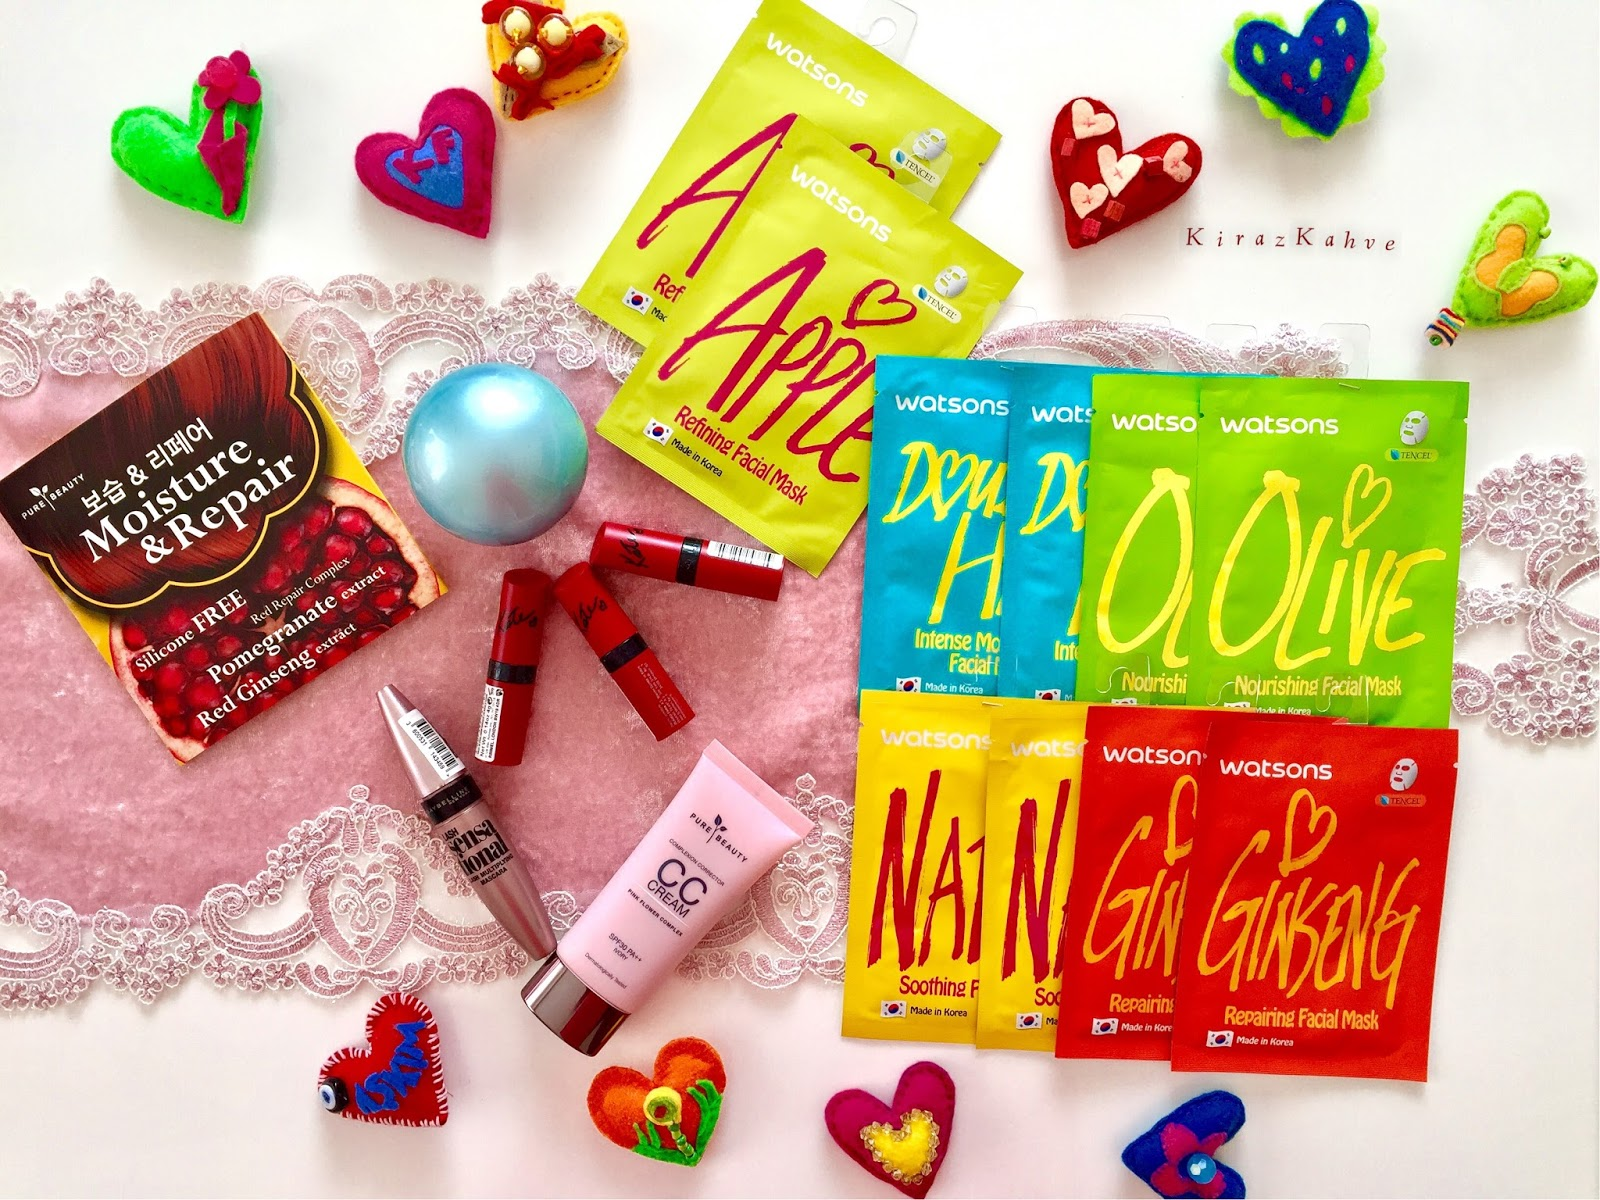 Rimmel Kate Ruj - Pure Beauty CC Cream - Pure Beauty Şampuan ve Saç Kremi Yorumlarım